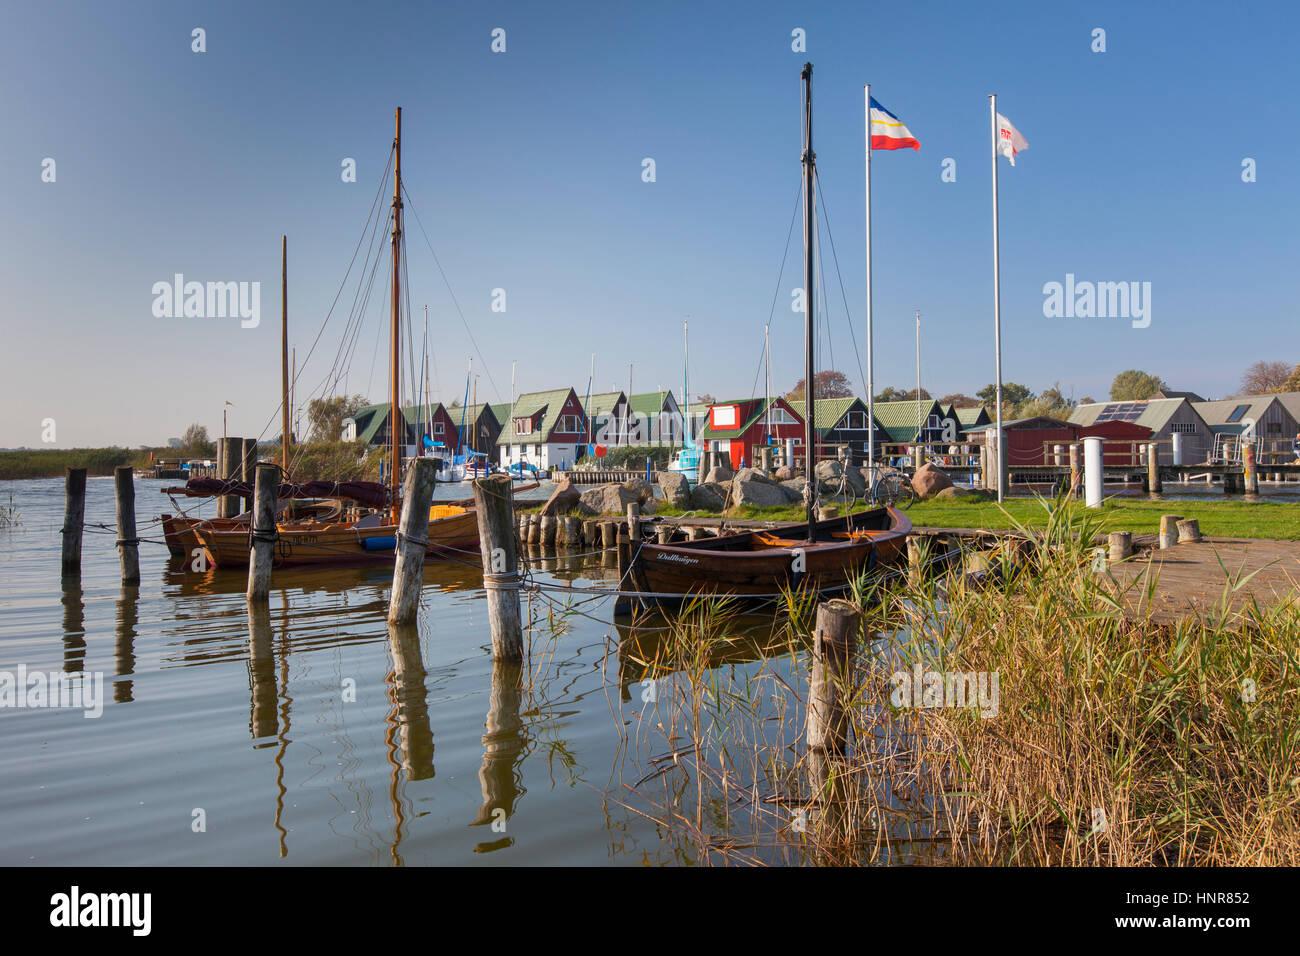 Sailing boats and boathouses at the harbour of Althagen at Fischland-Darß-Zingst, Mecklenburg-Vorpommern, Germany - Stock Image